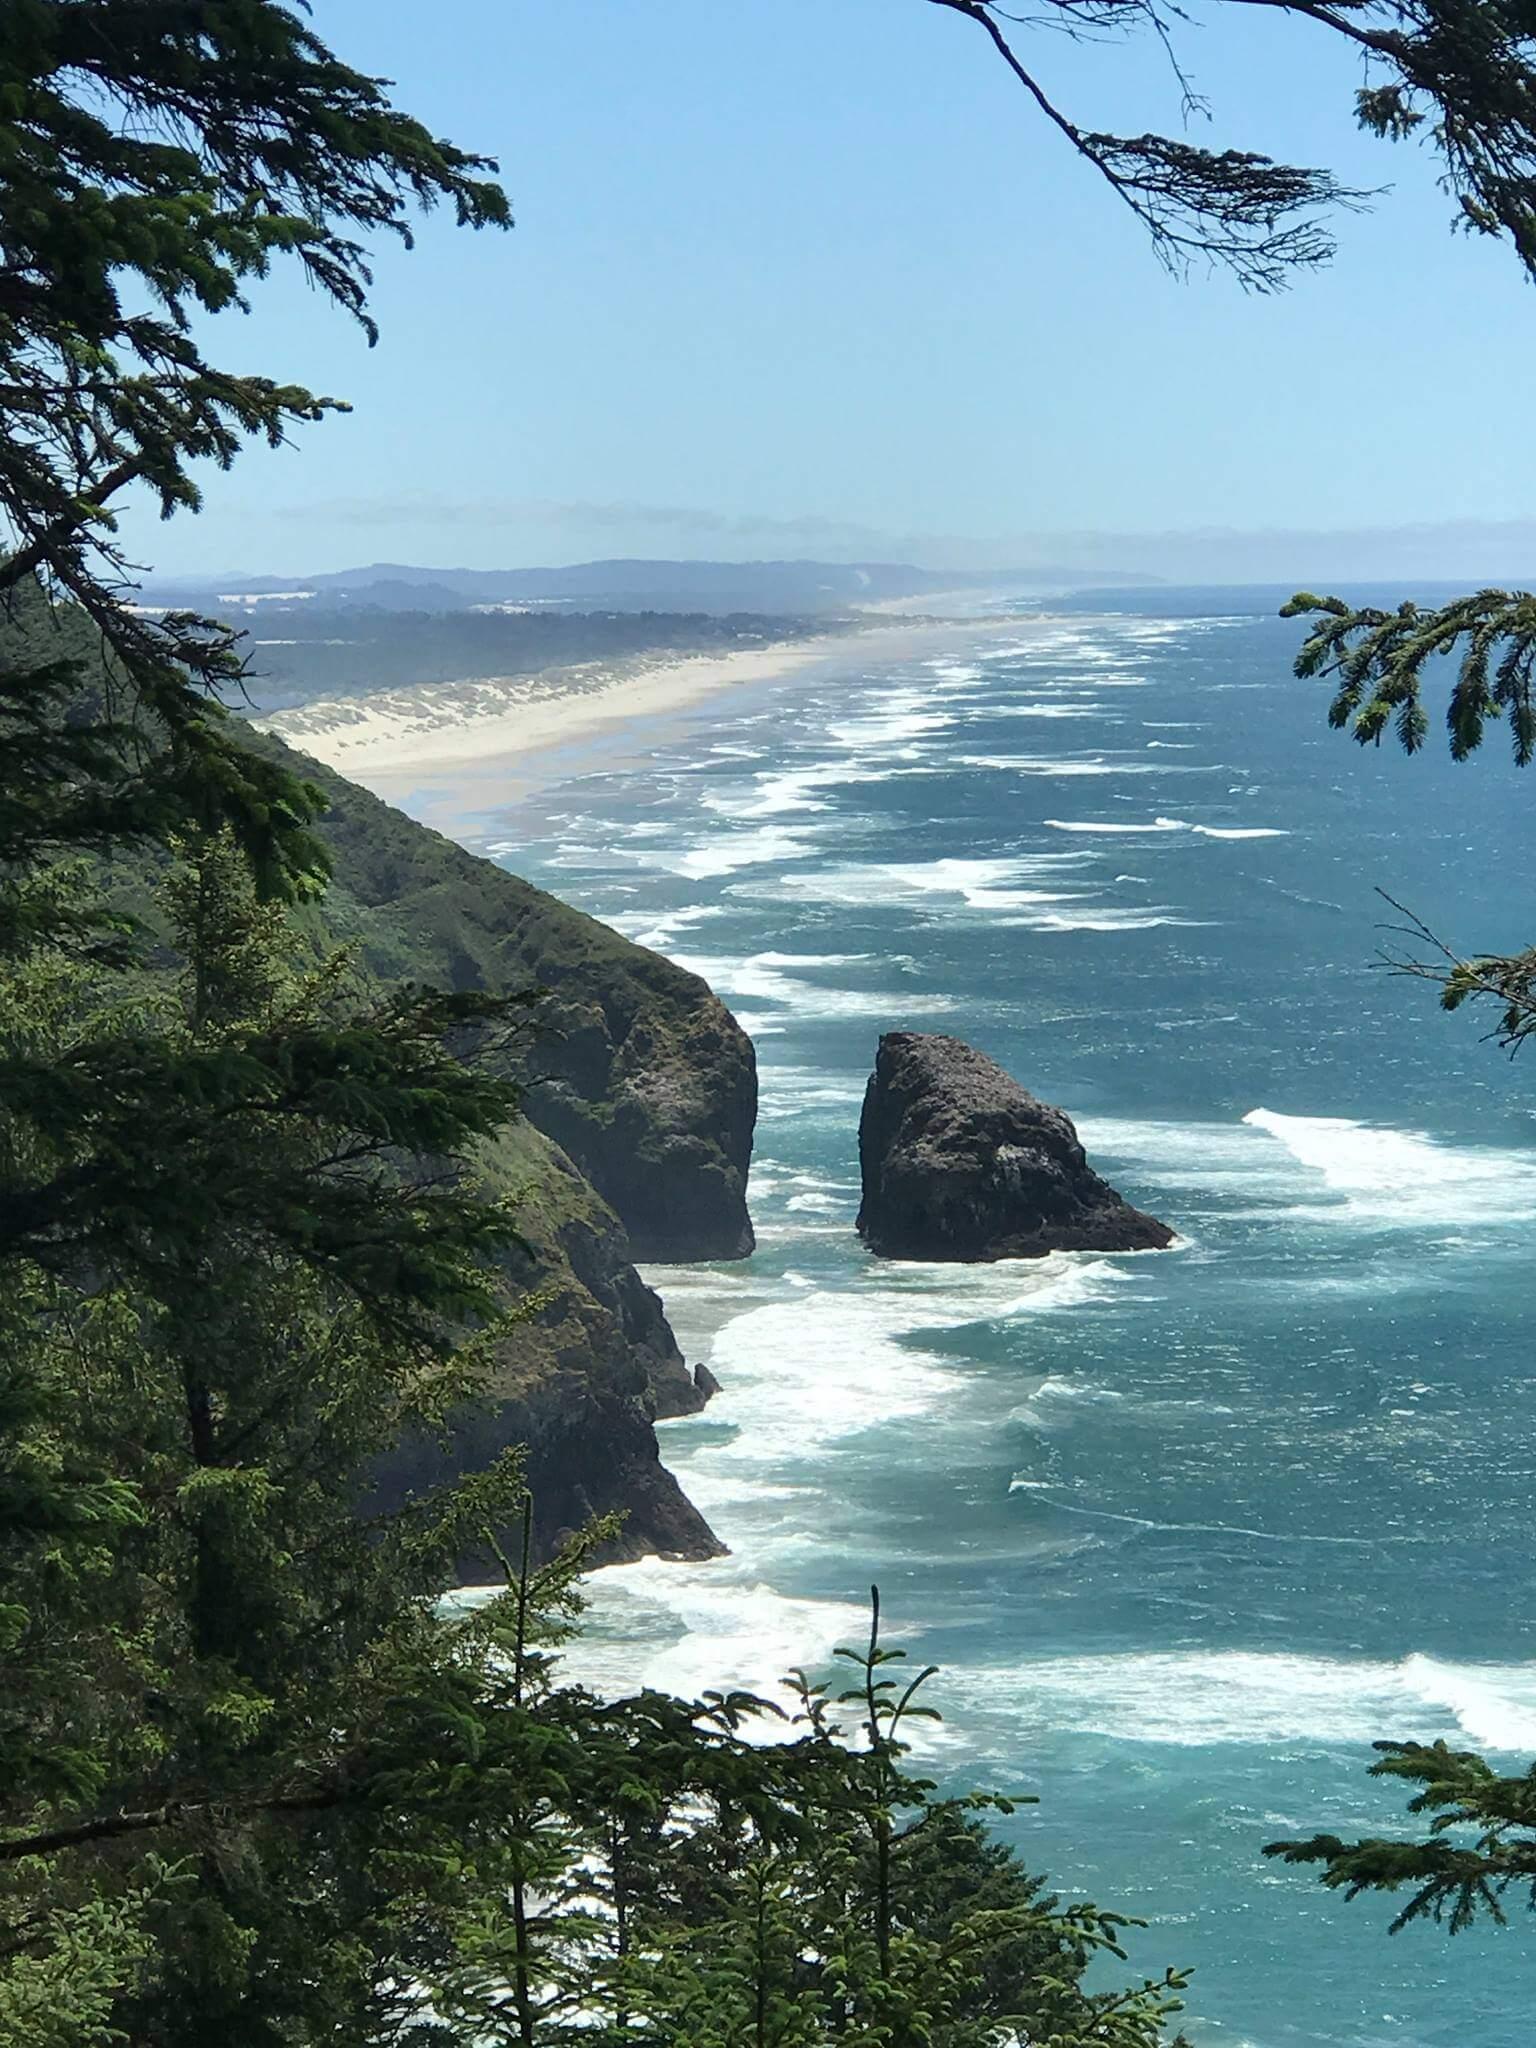 the coastline where the ocean meets the sand